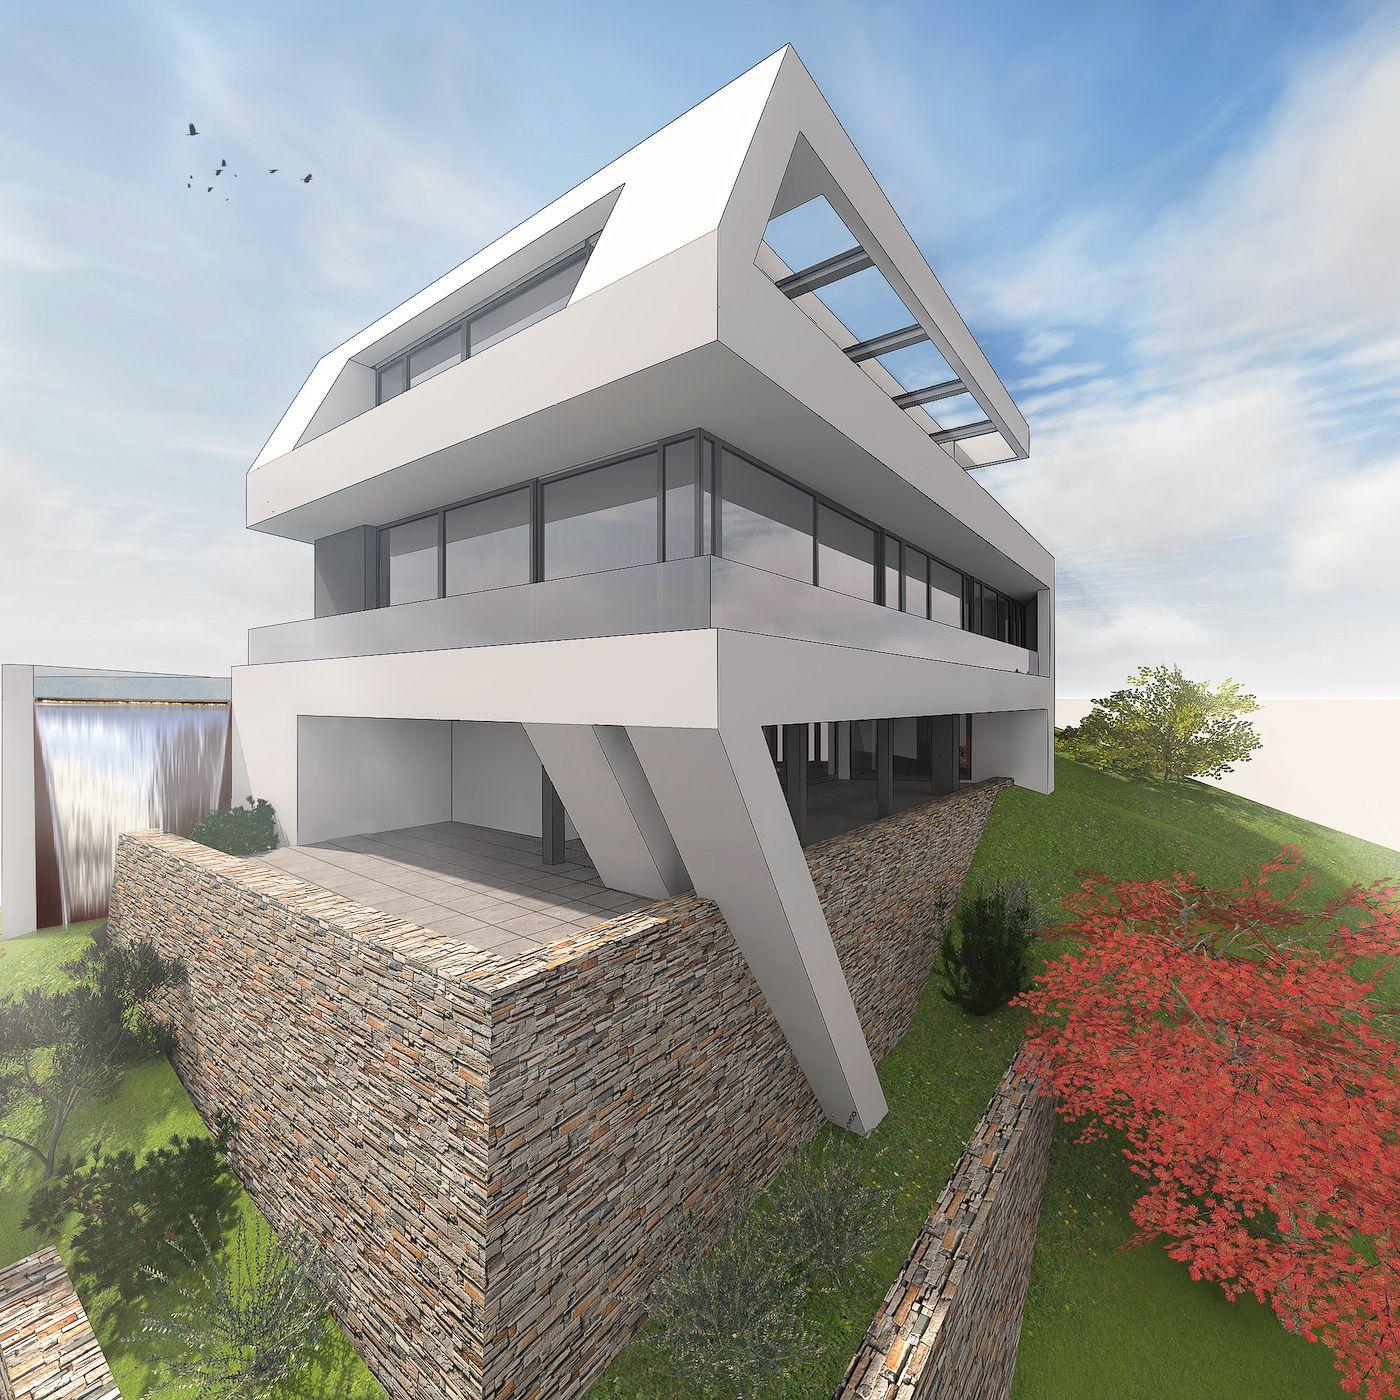 Modernes wohnhaus am hang by for Modernes wohnhaus